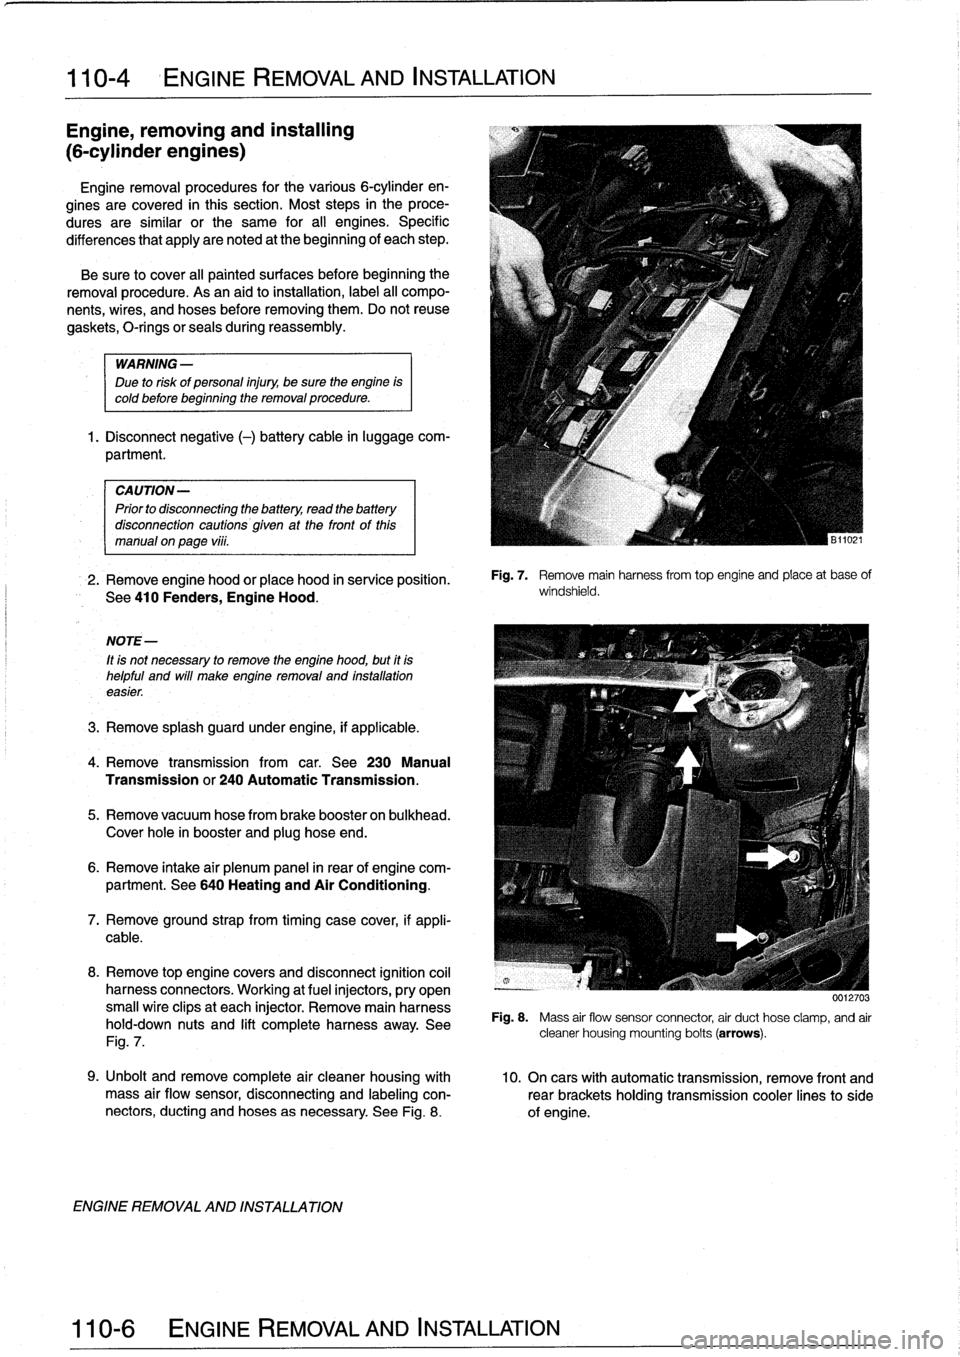 Bmw 325i 1994 E36 Workshop Manual 94 Engine Wiring Harness